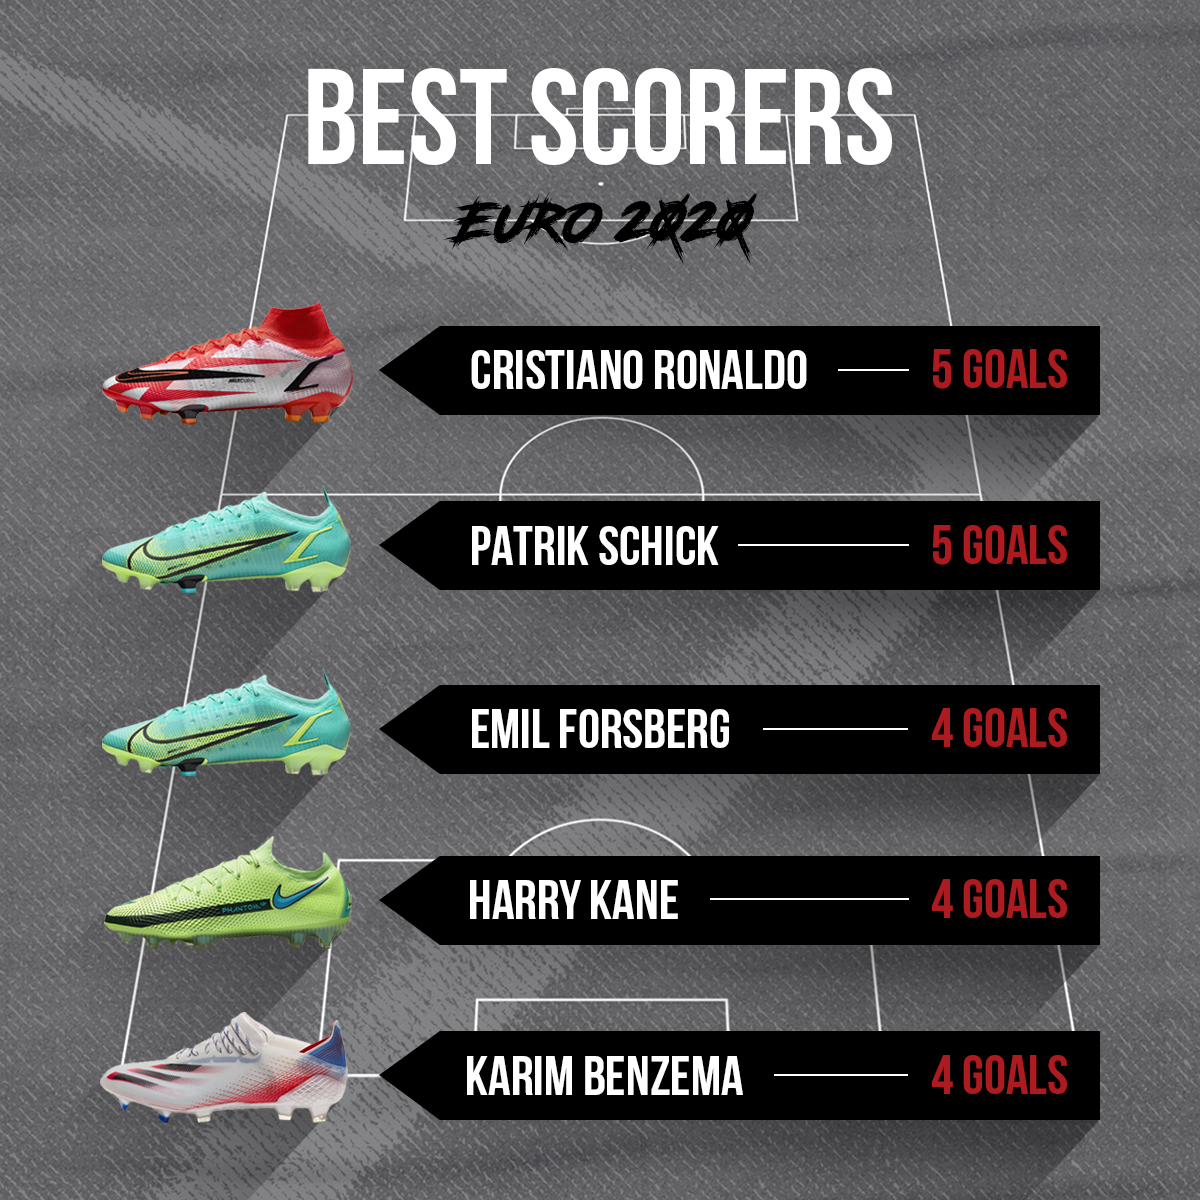 The best scorers